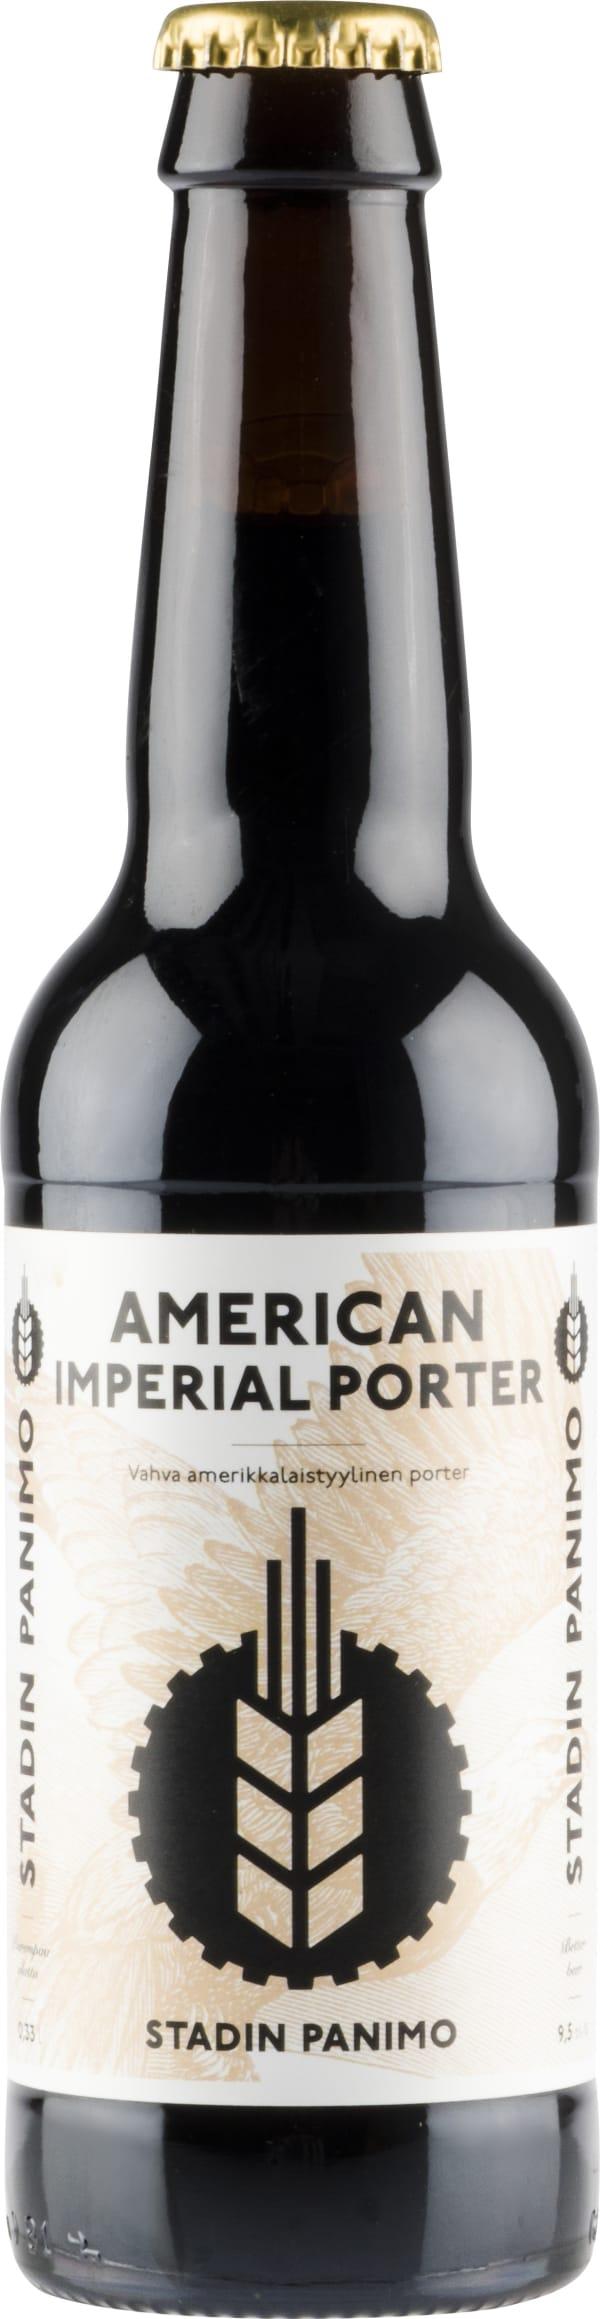 Stadin Panimo American Imperial Porter